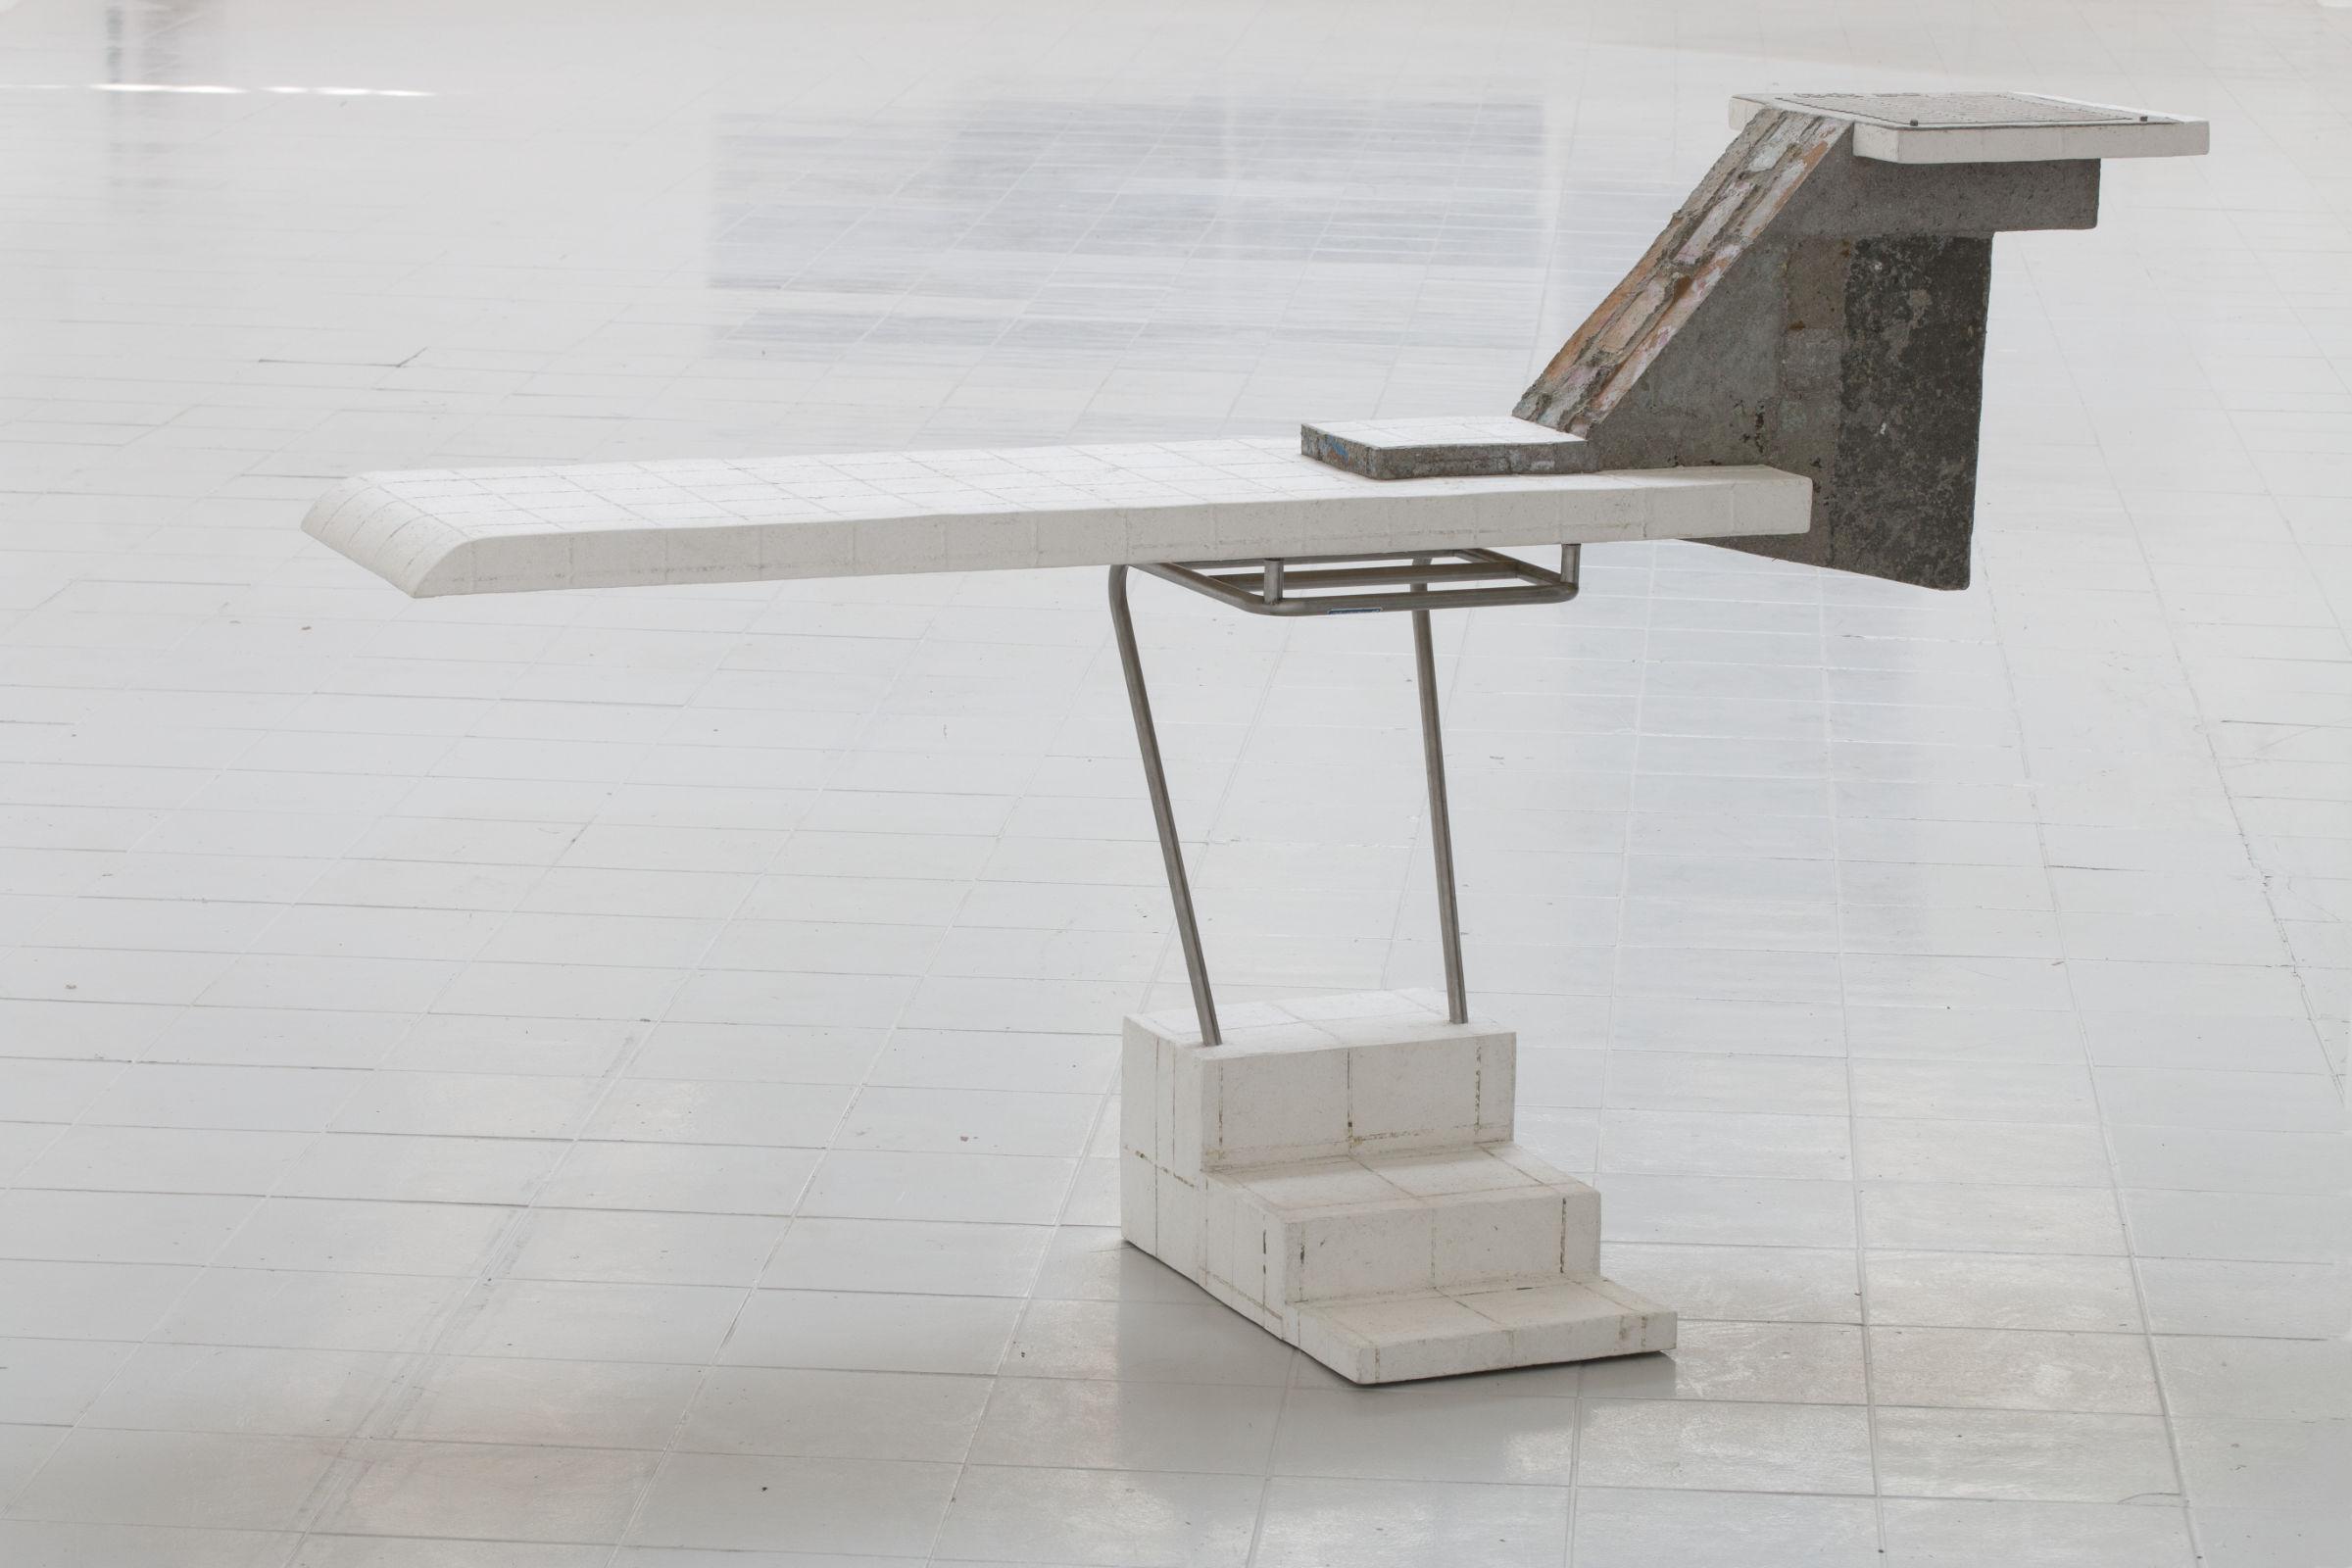 free-jump-_-2019-_-Papermachewallimprints-steel-210cm-160cm-50cm_MG_0147